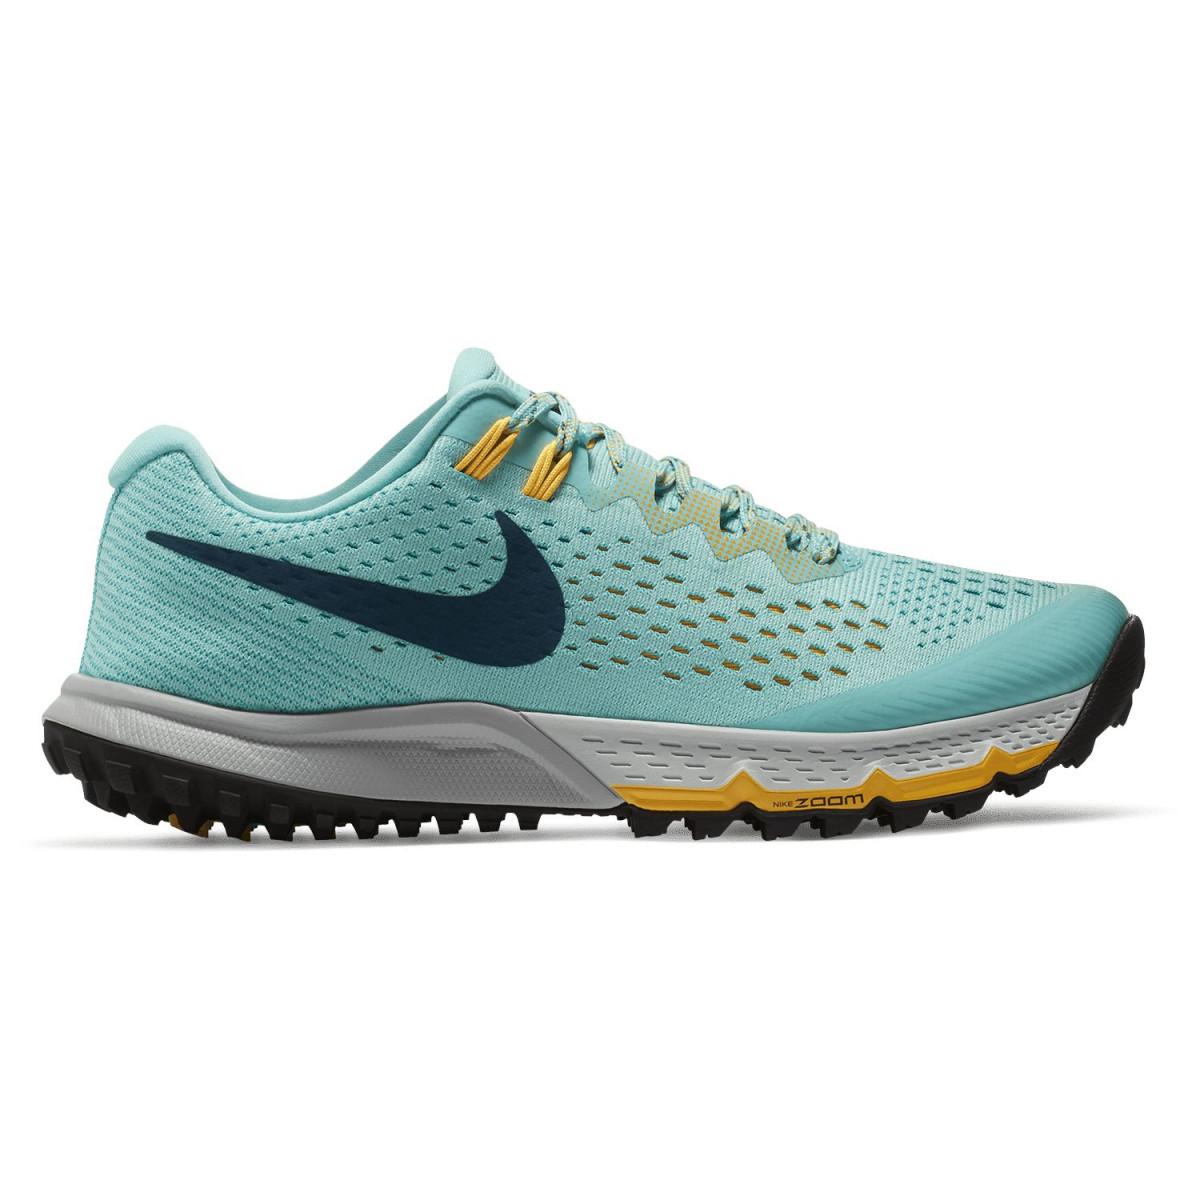 new product 8d460 0f8b4 Zapatillas Nike Air Zoom Terra Kiger 4